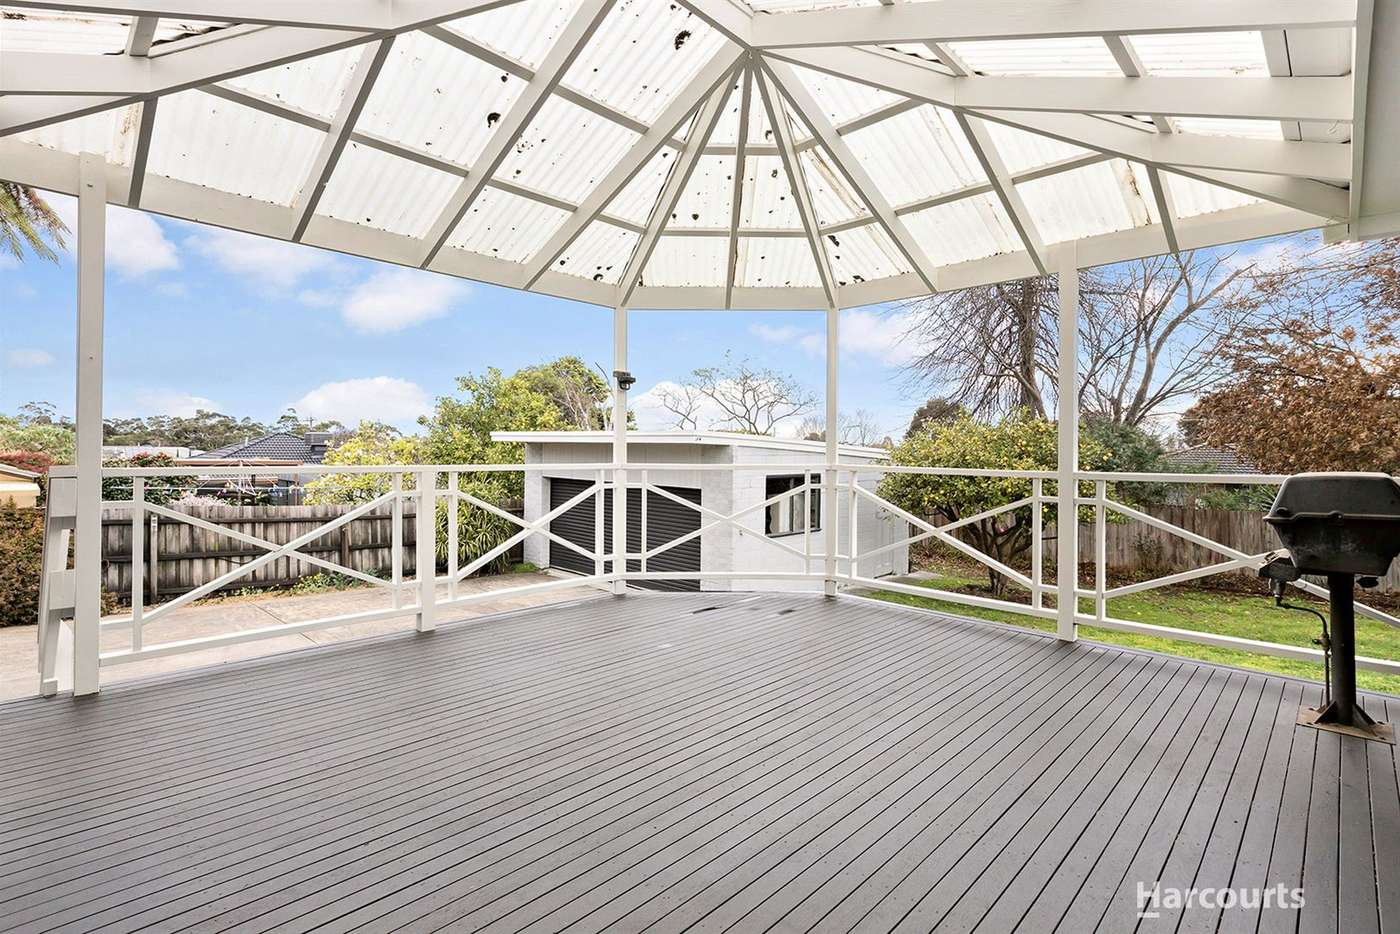 Sixth view of Homely house listing, 9 Leonard Court, Pakenham VIC 3810